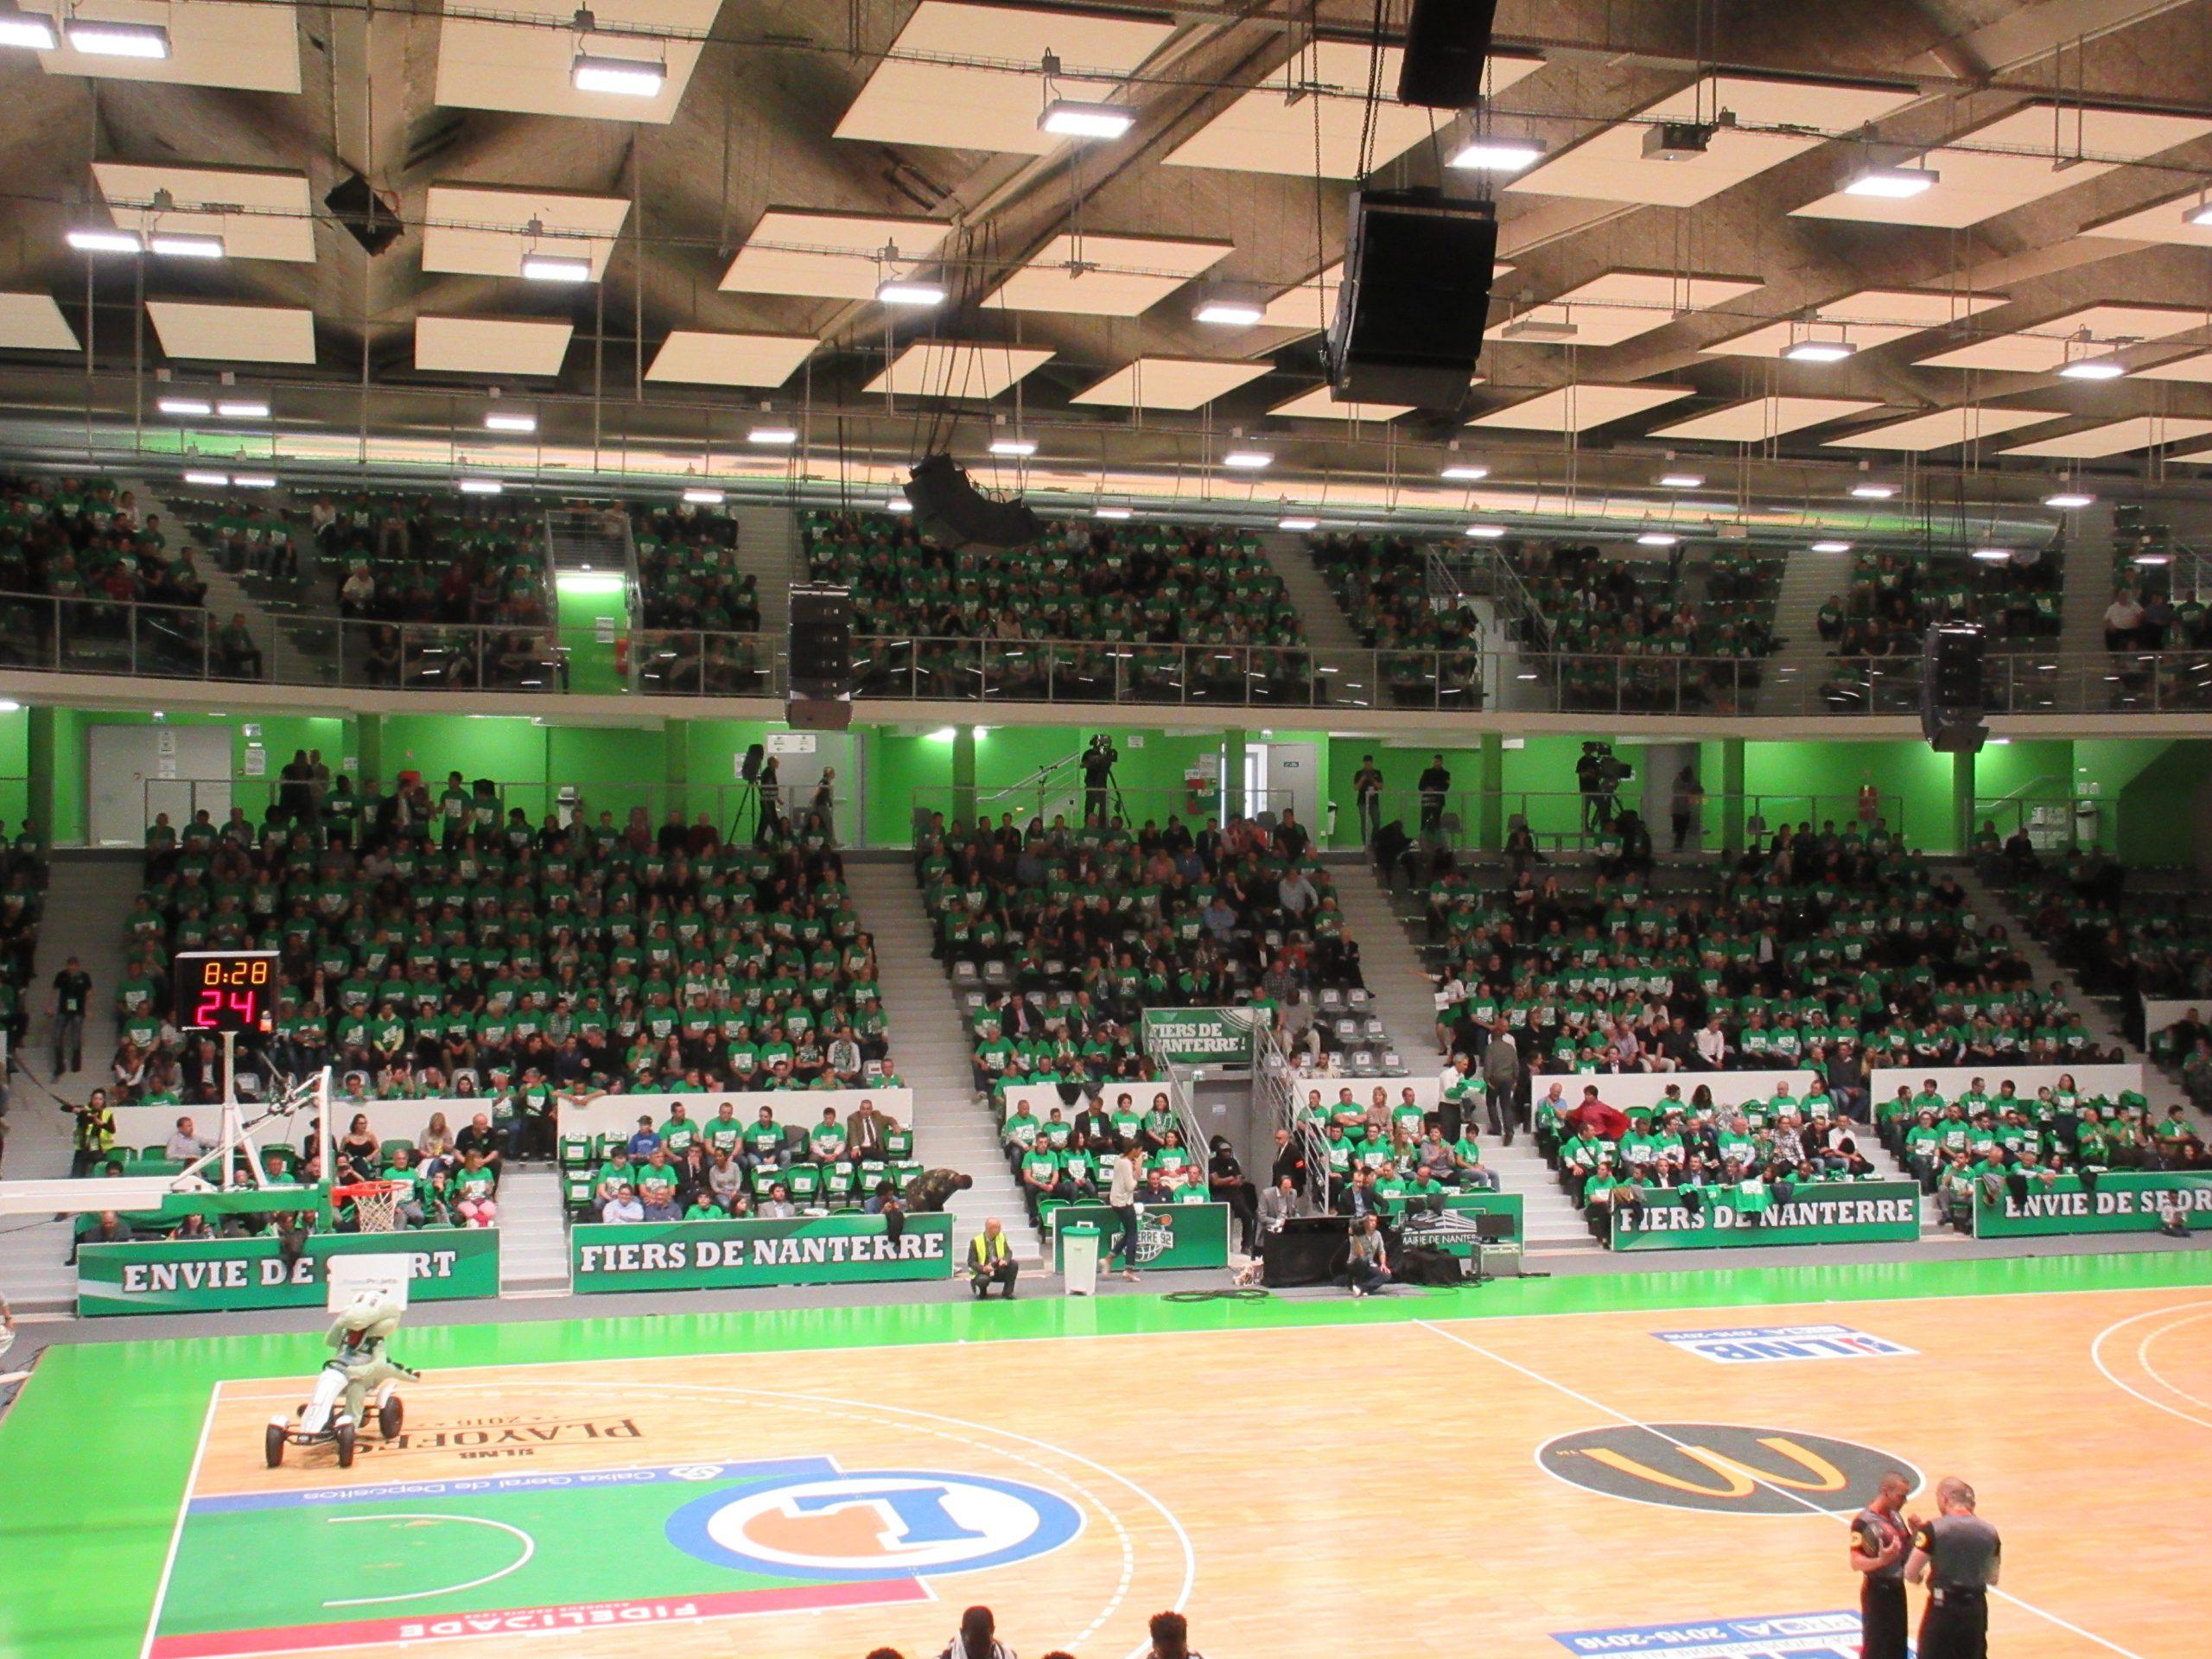 Palais Des Sports Maurice Thorez - Wikipedia tout Piscine Du Palais Des Sports À Nanterre Nanterre